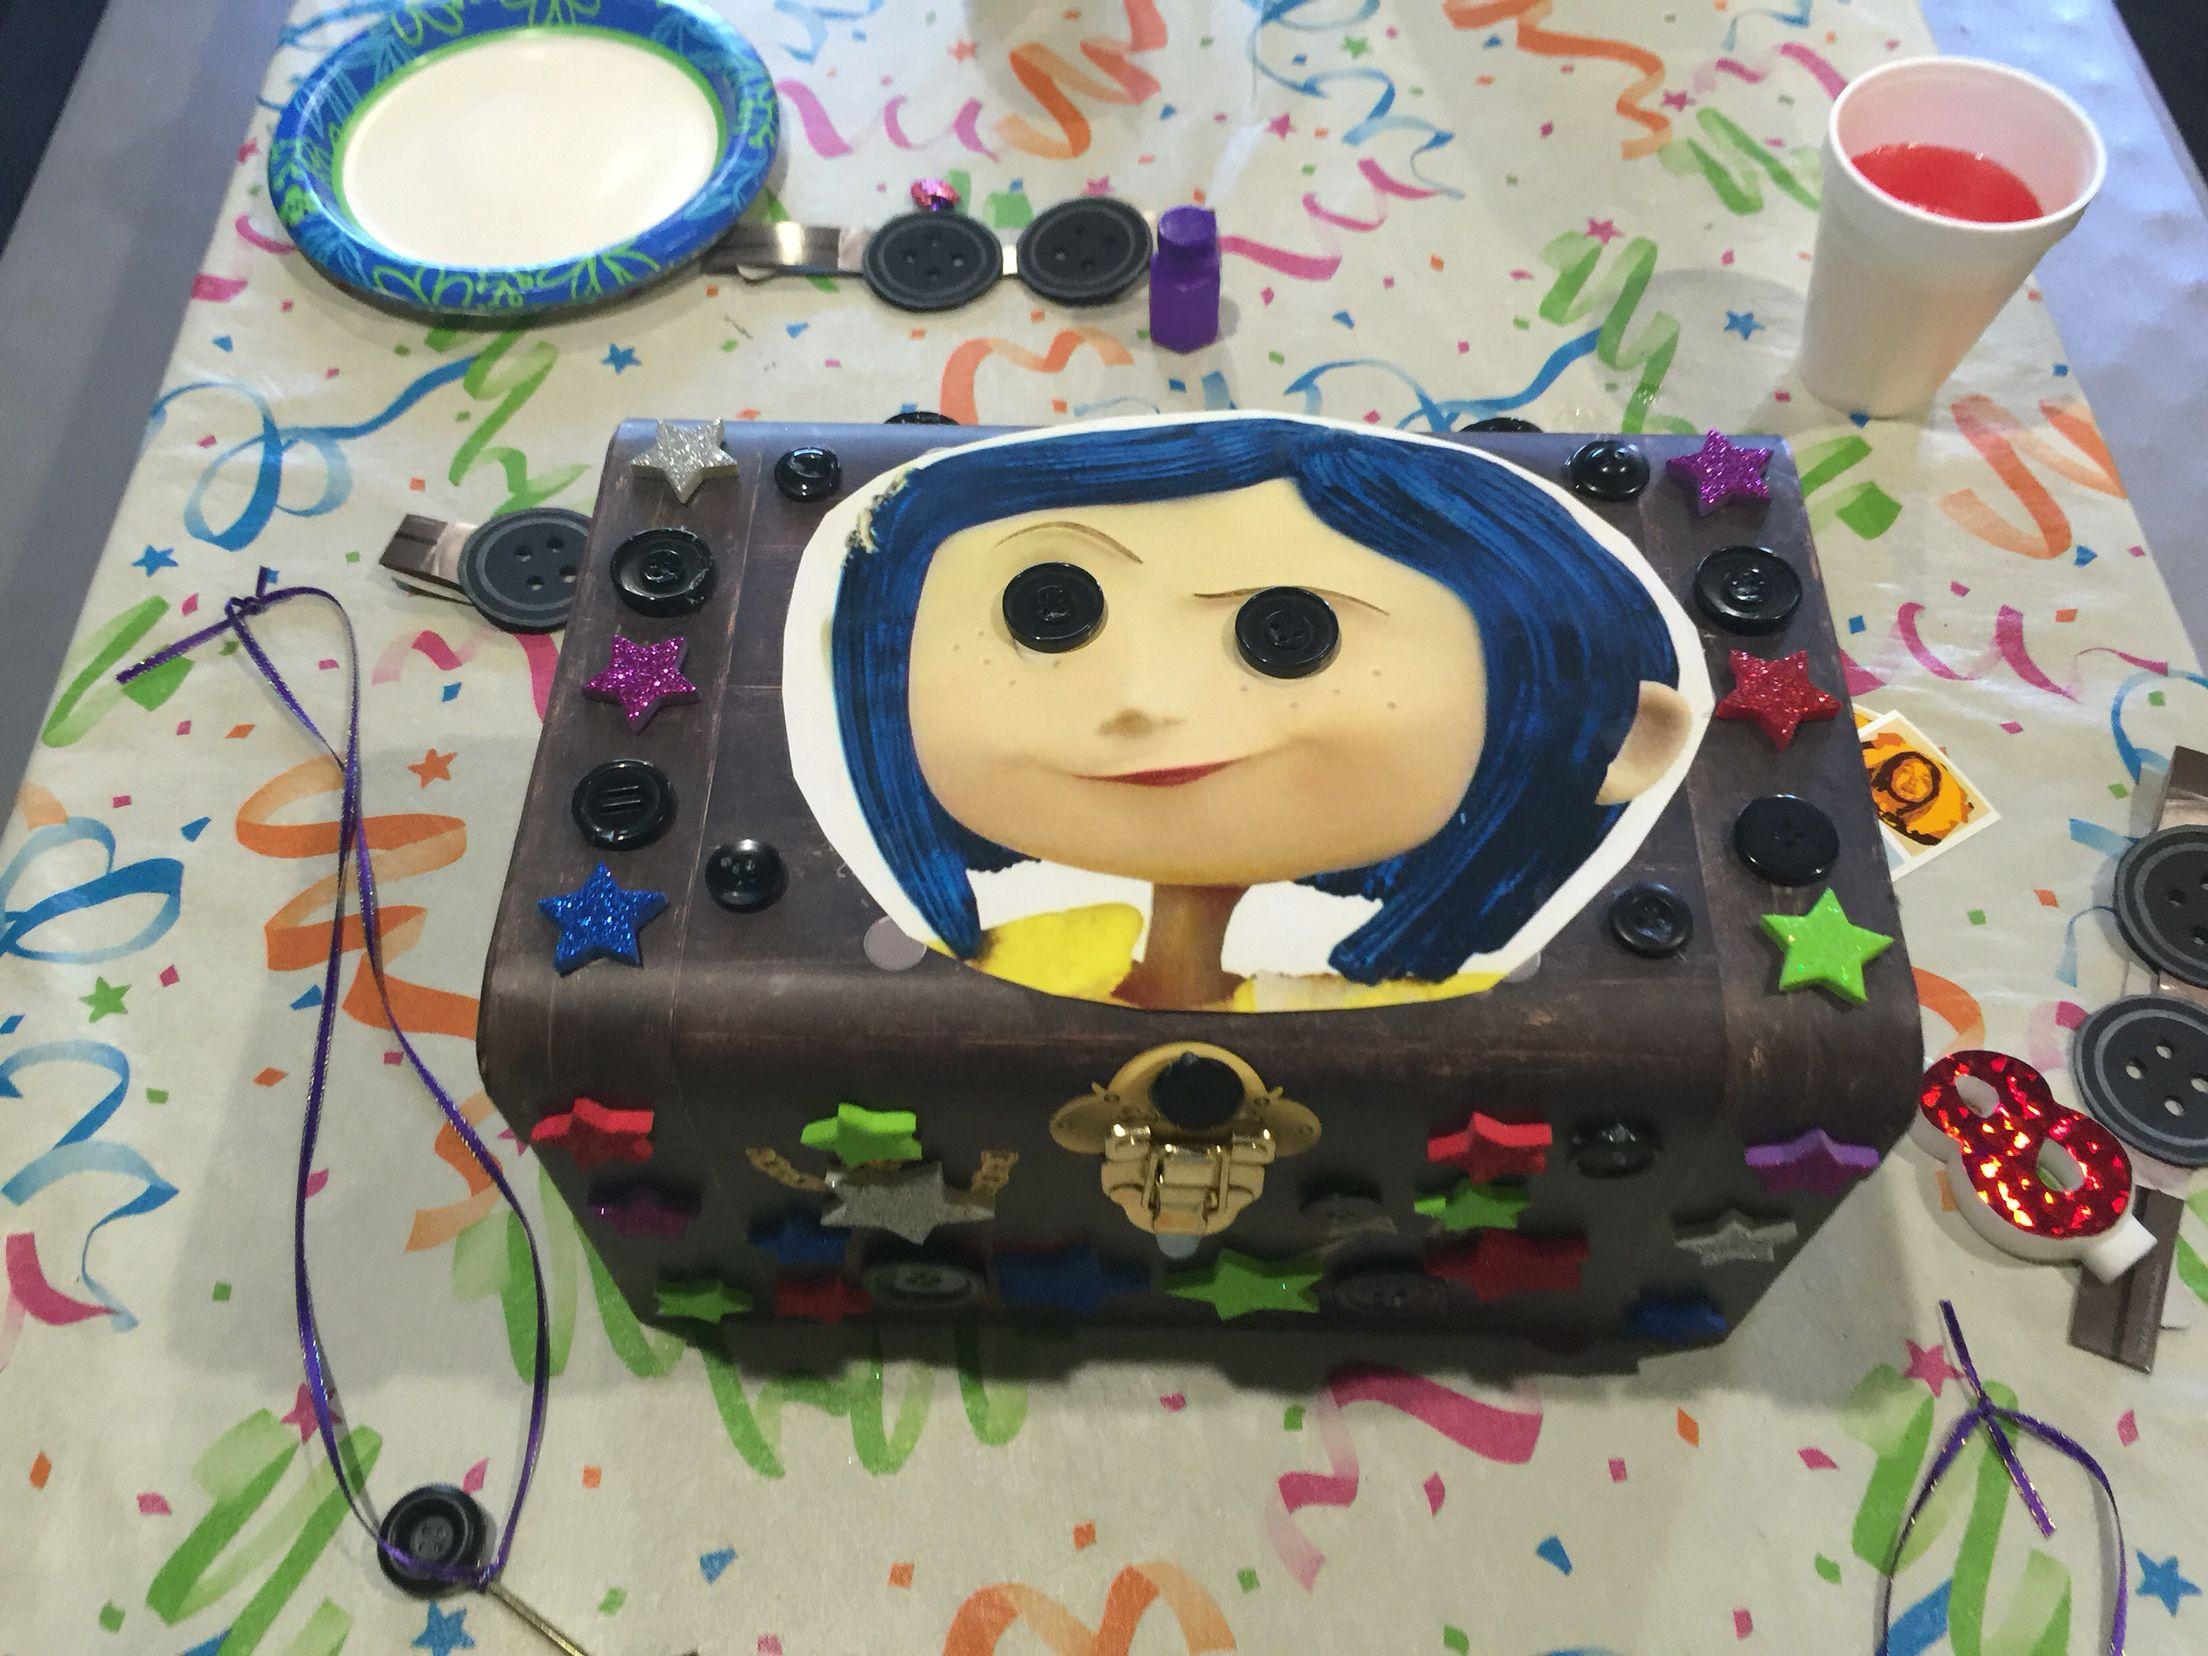 How To Decorate A Treasure Box Coraline Treasure Box  Coraline Birthday Party Decorations